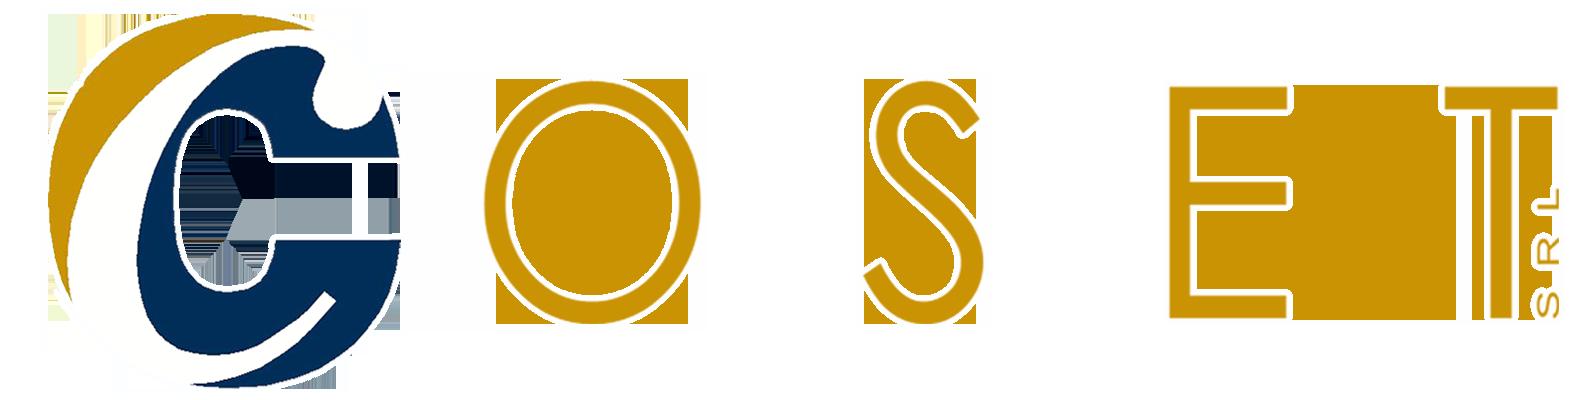 Coset s.r.l.